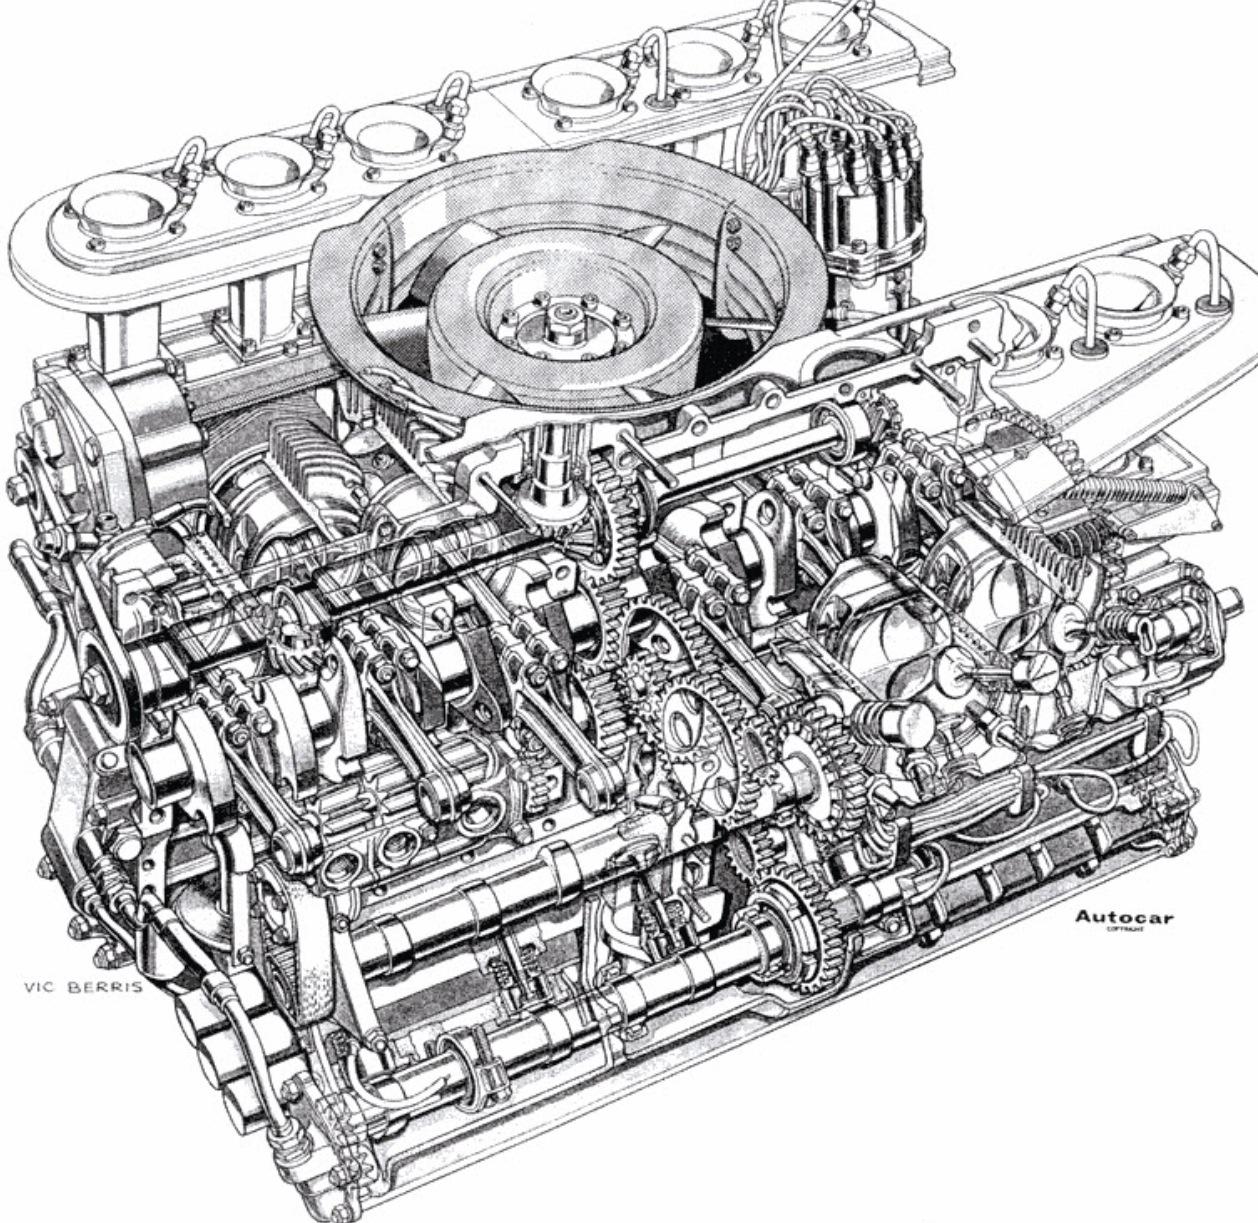 hight resolution of porsche engine diagram wiring diagram library 1966 porsche engine diagram the amazo effect the cutaway diagram